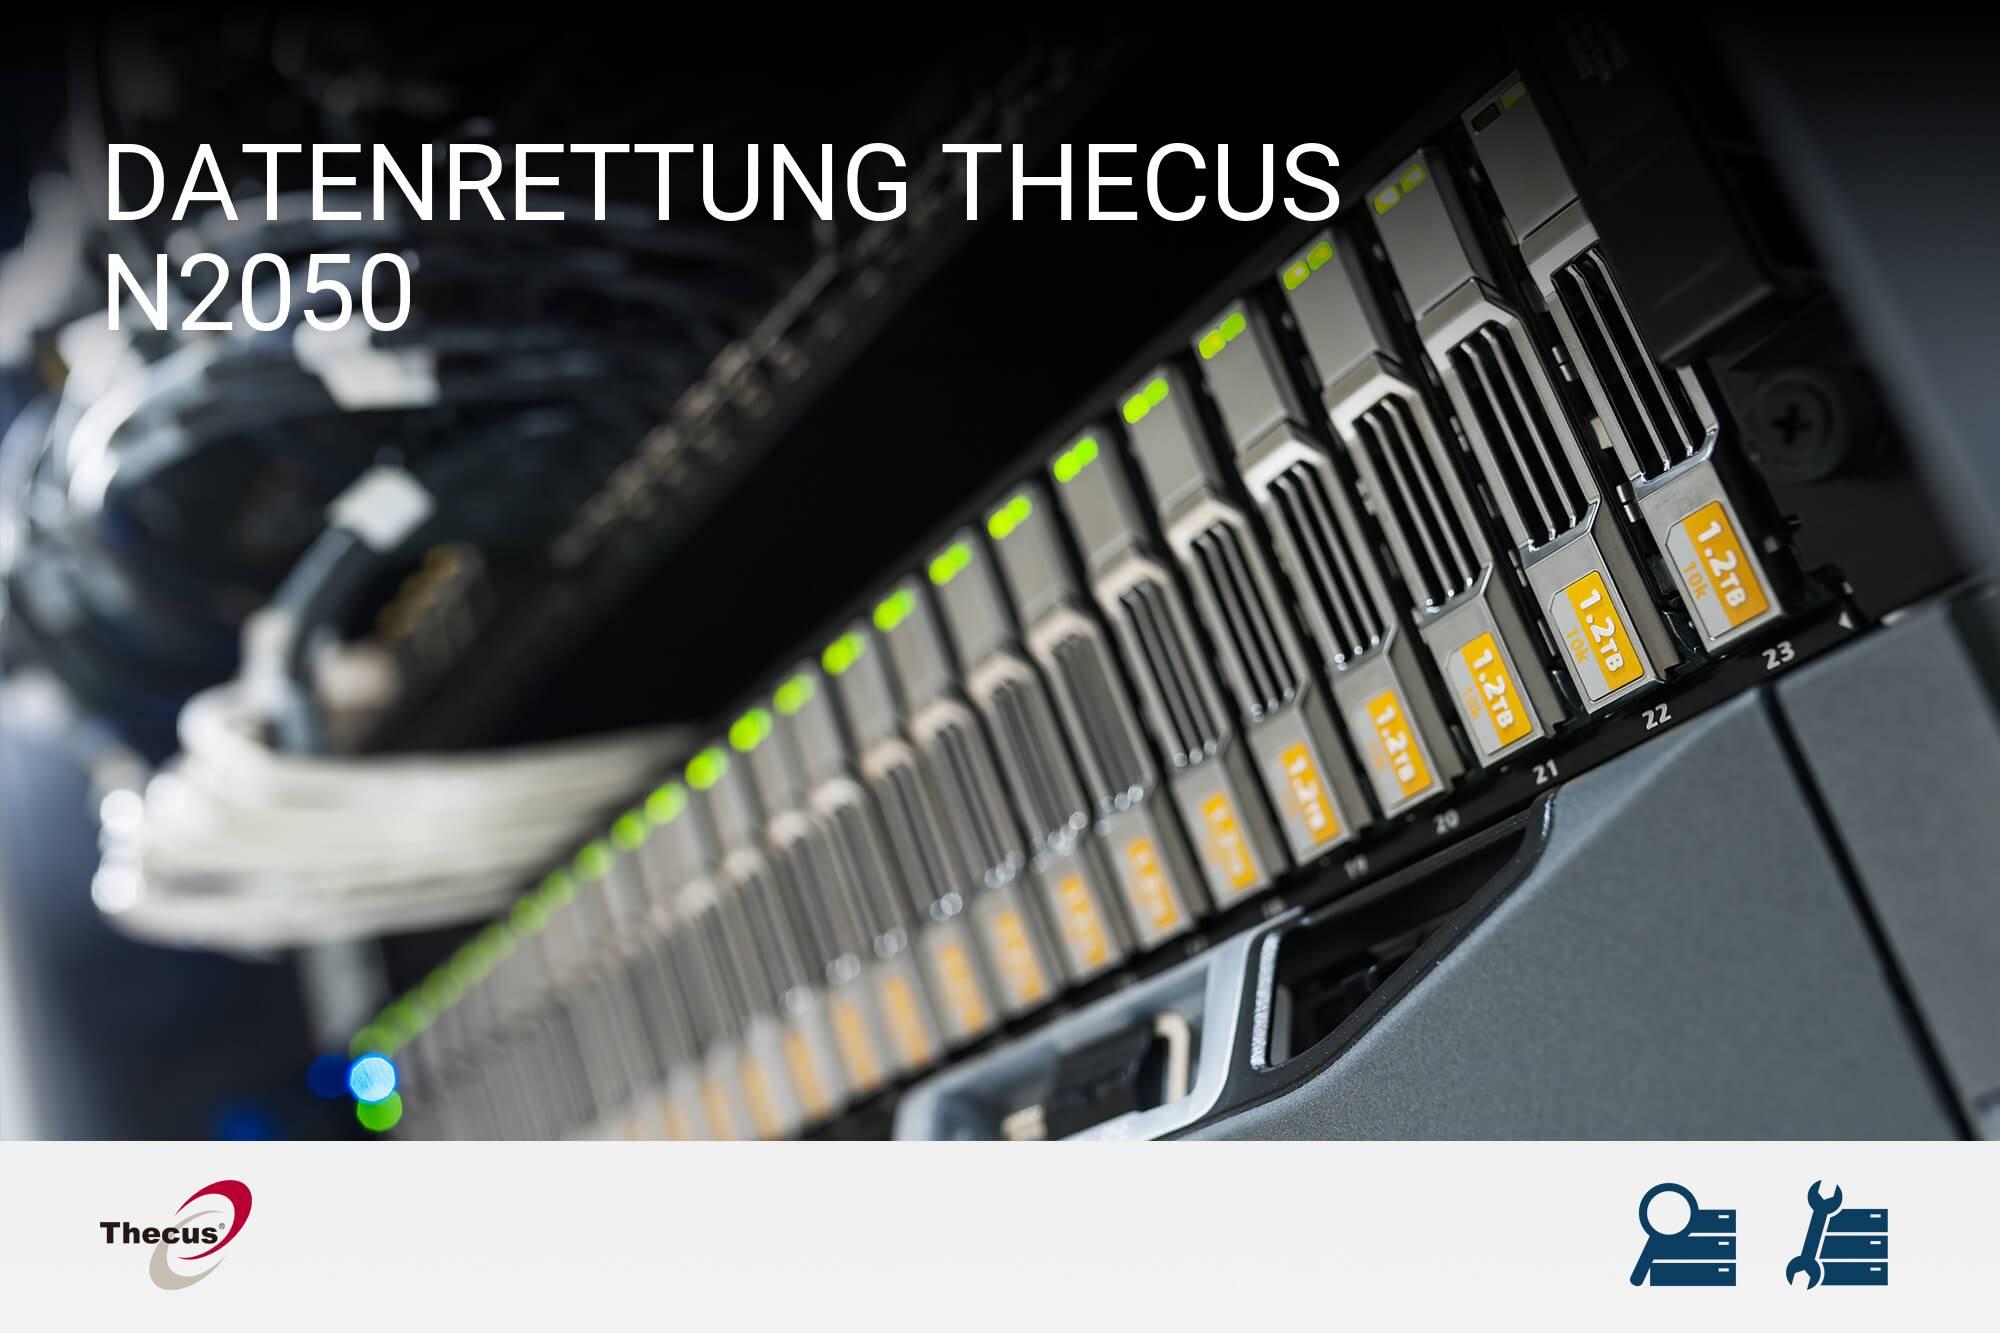 Thecus N2050